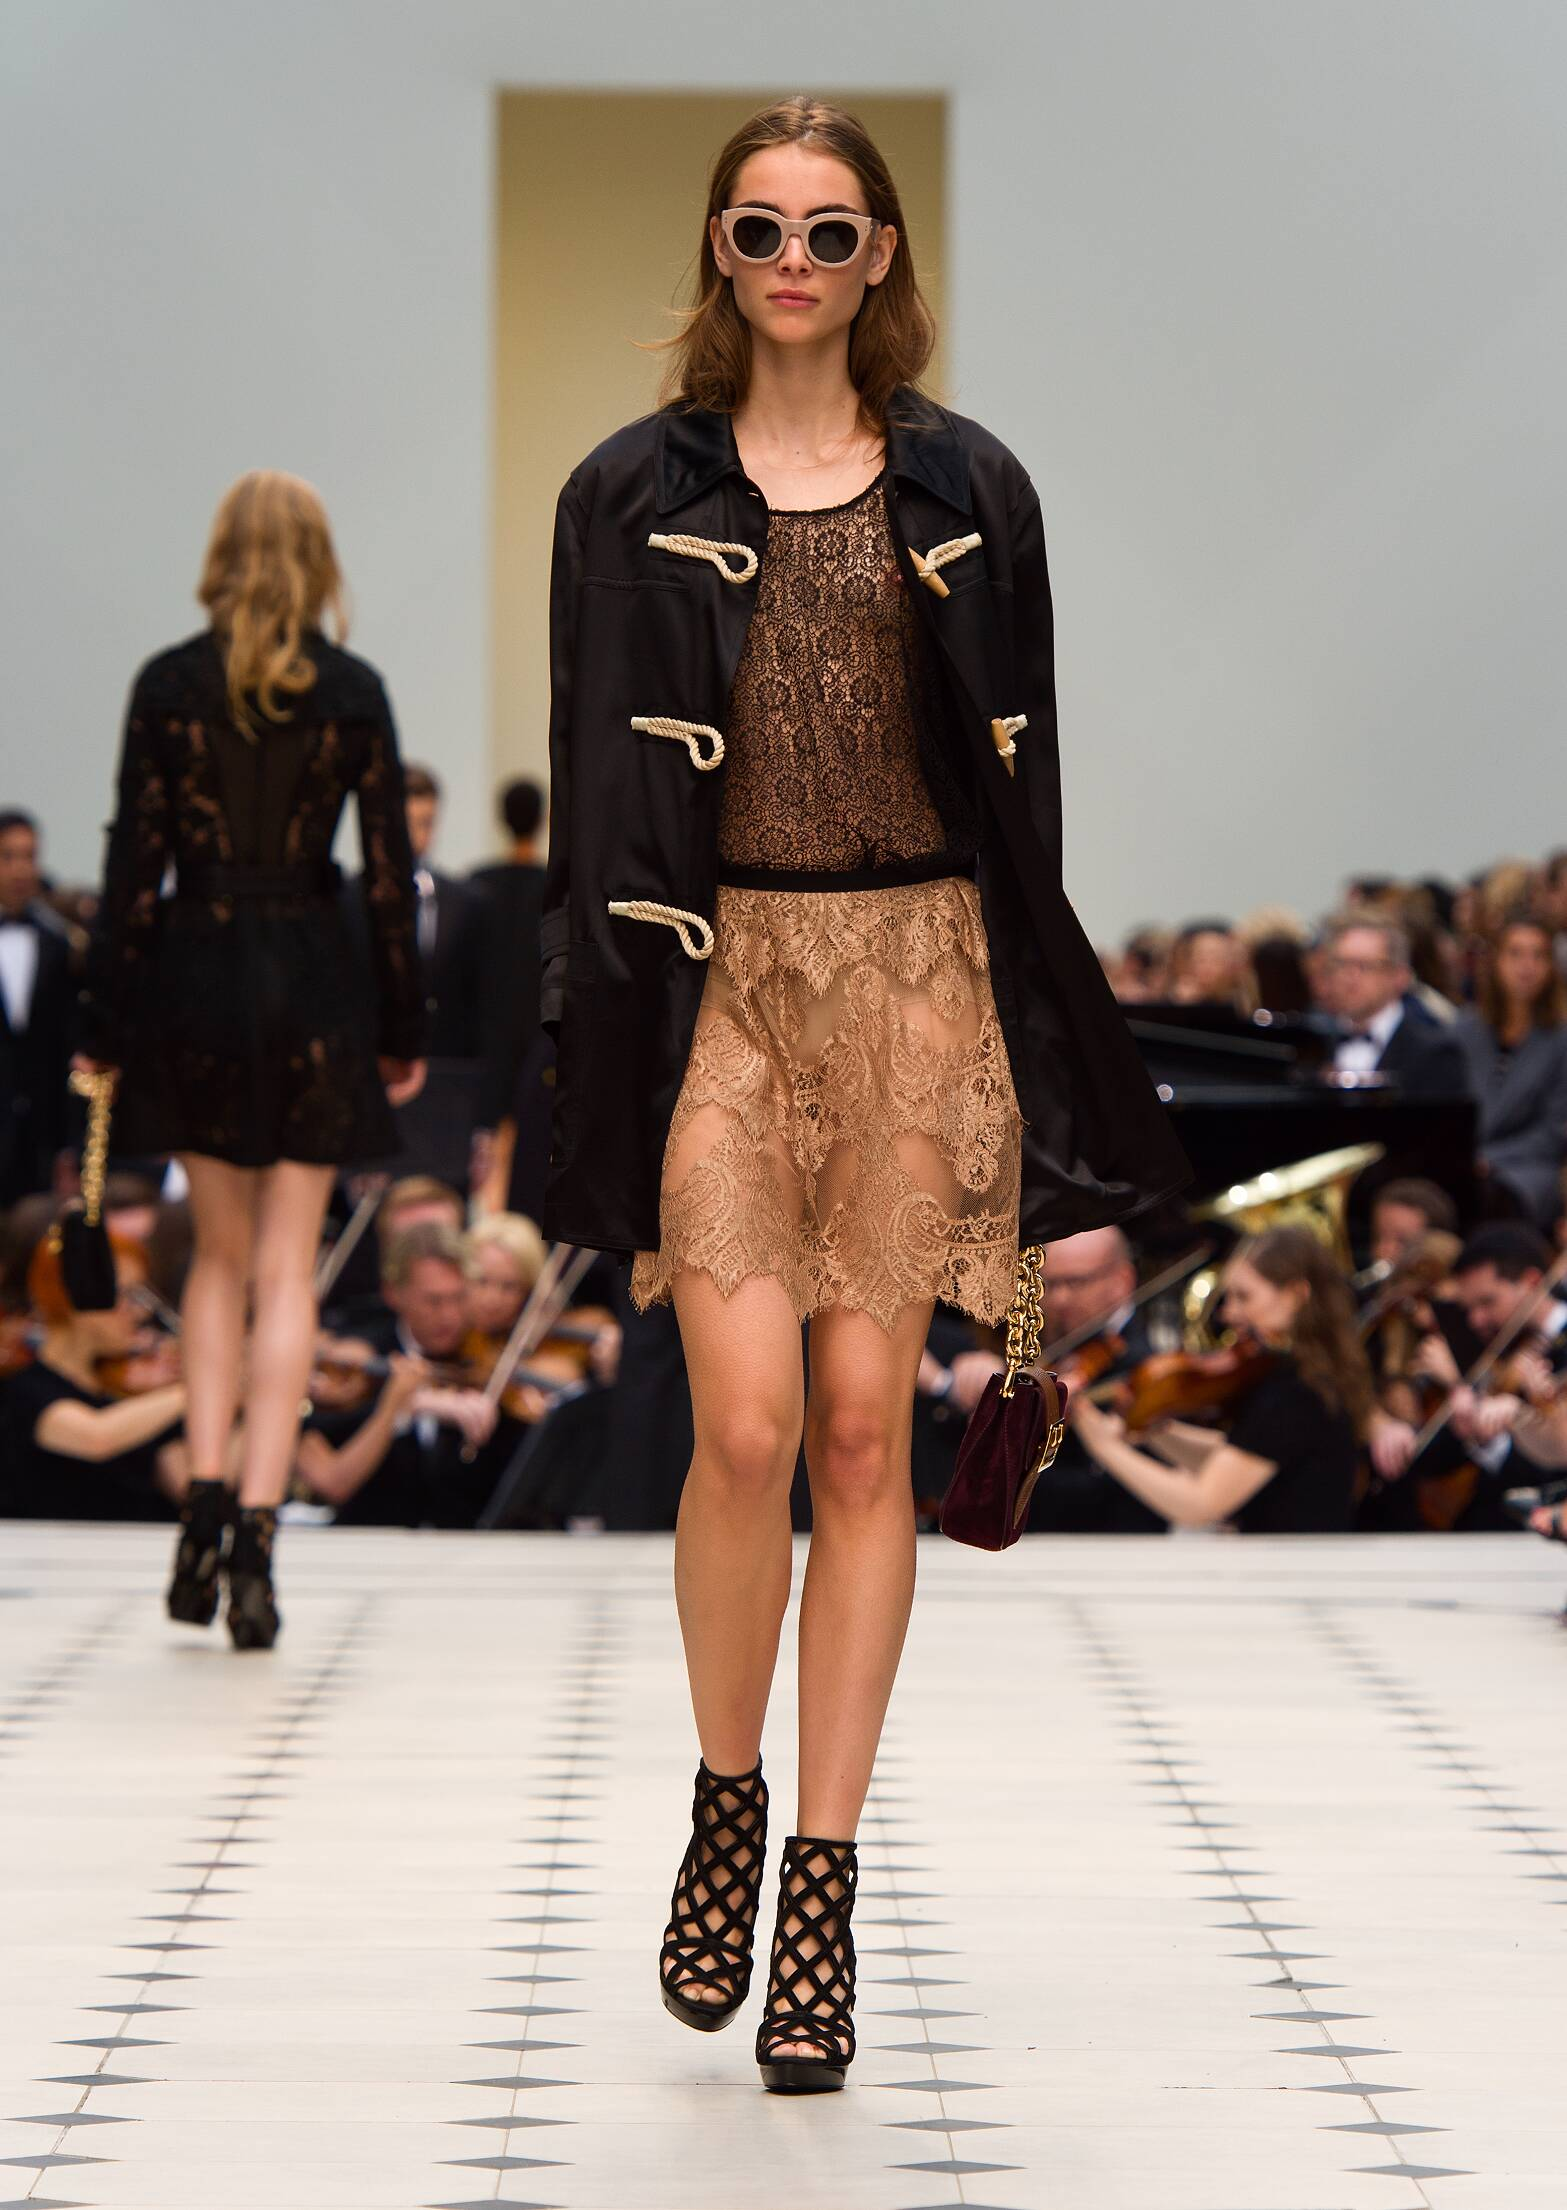 Fashion Model Burberry Prorsum Catwalk